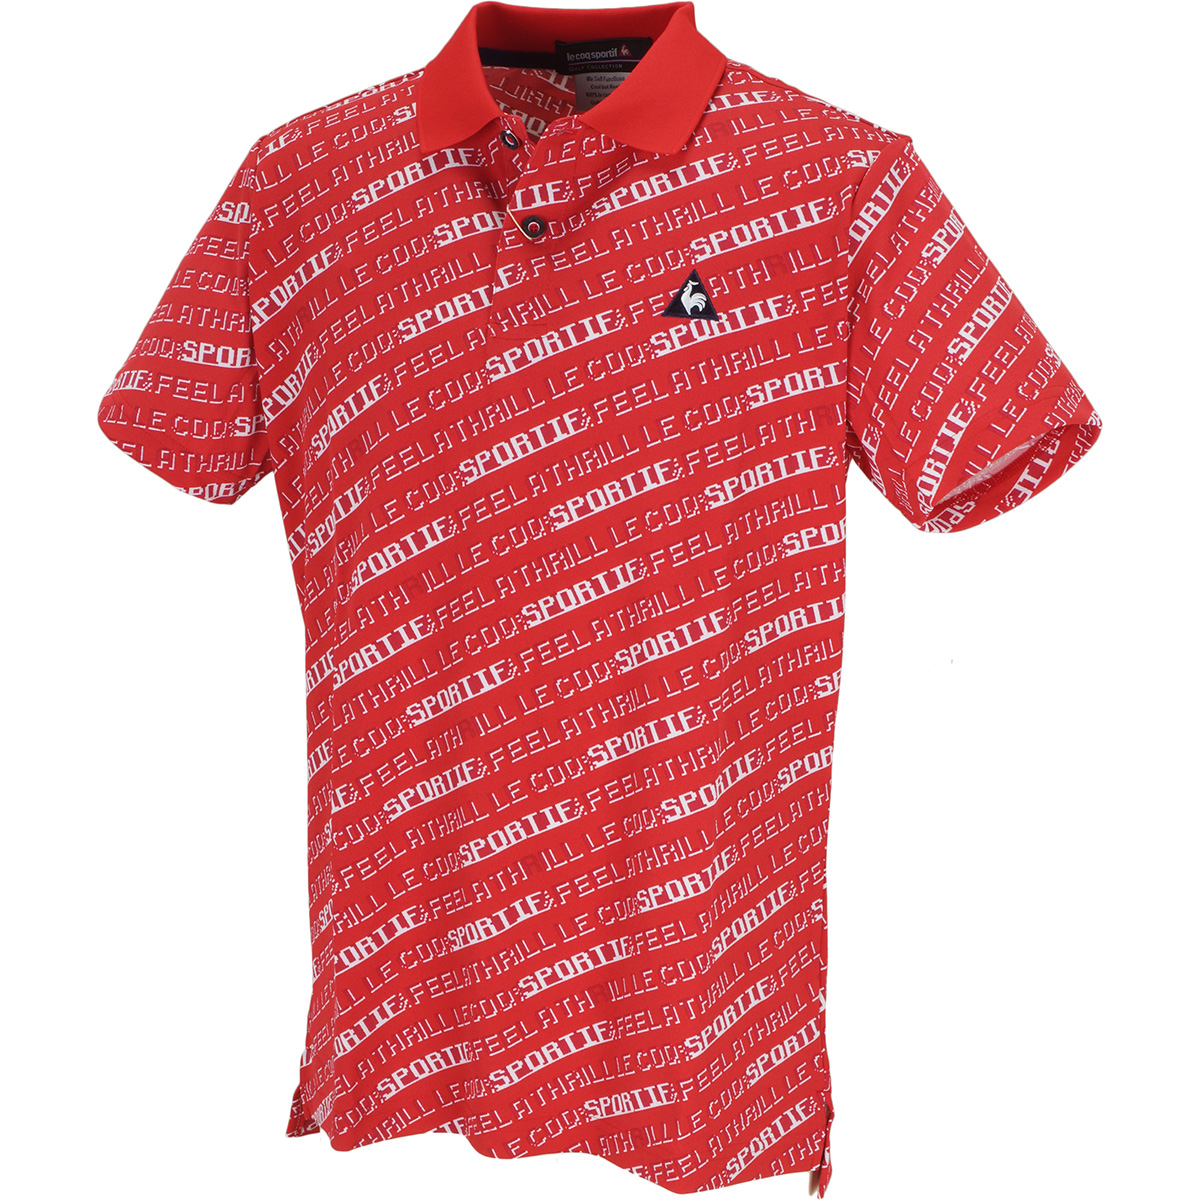 8bitロゴプリント 半袖ポロシャツ